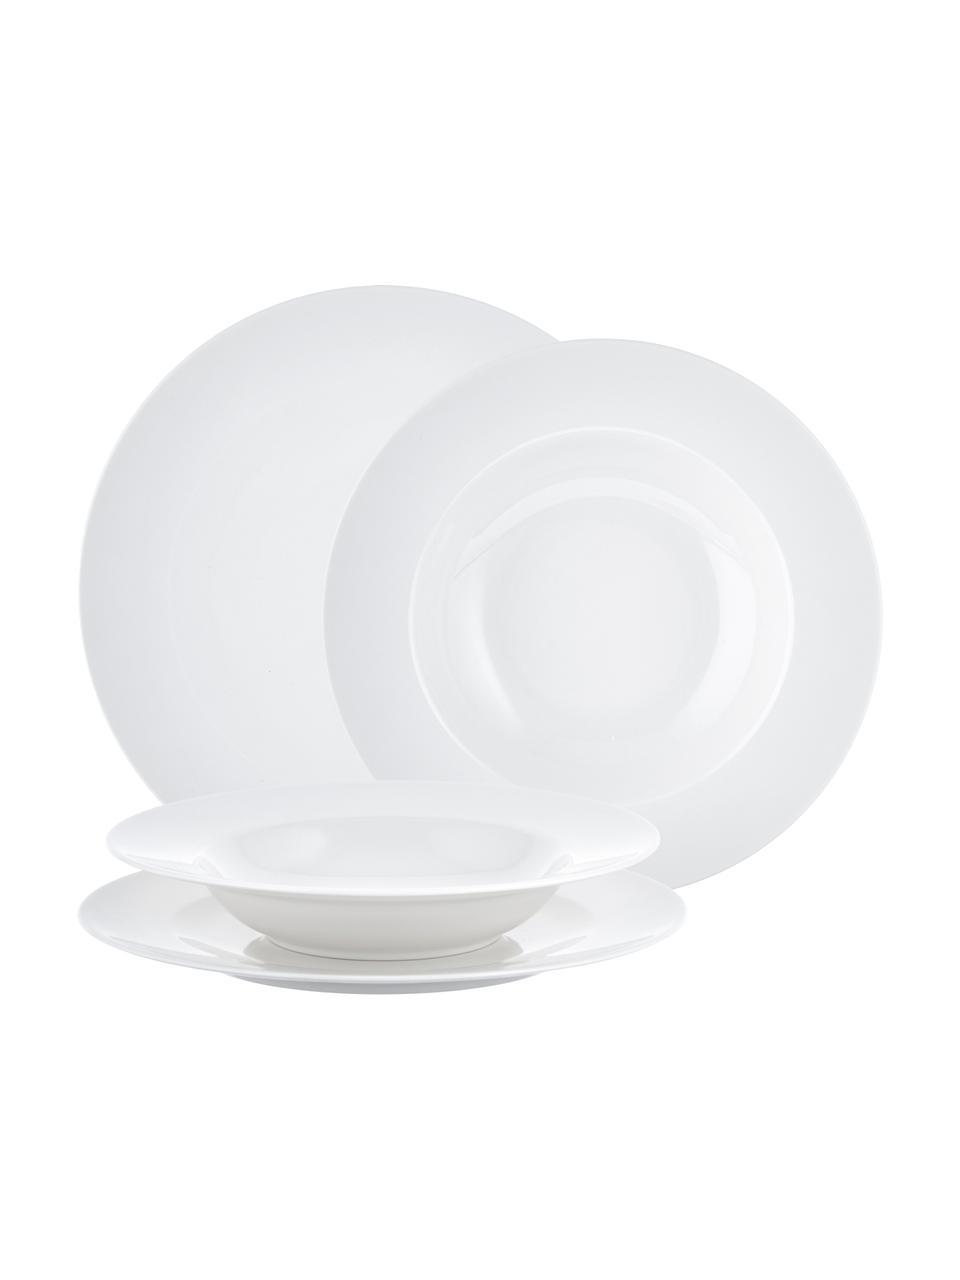 Servizio di porcellana For Me 8 pz, Porcellana, Bianco latteo, Set in varie misure